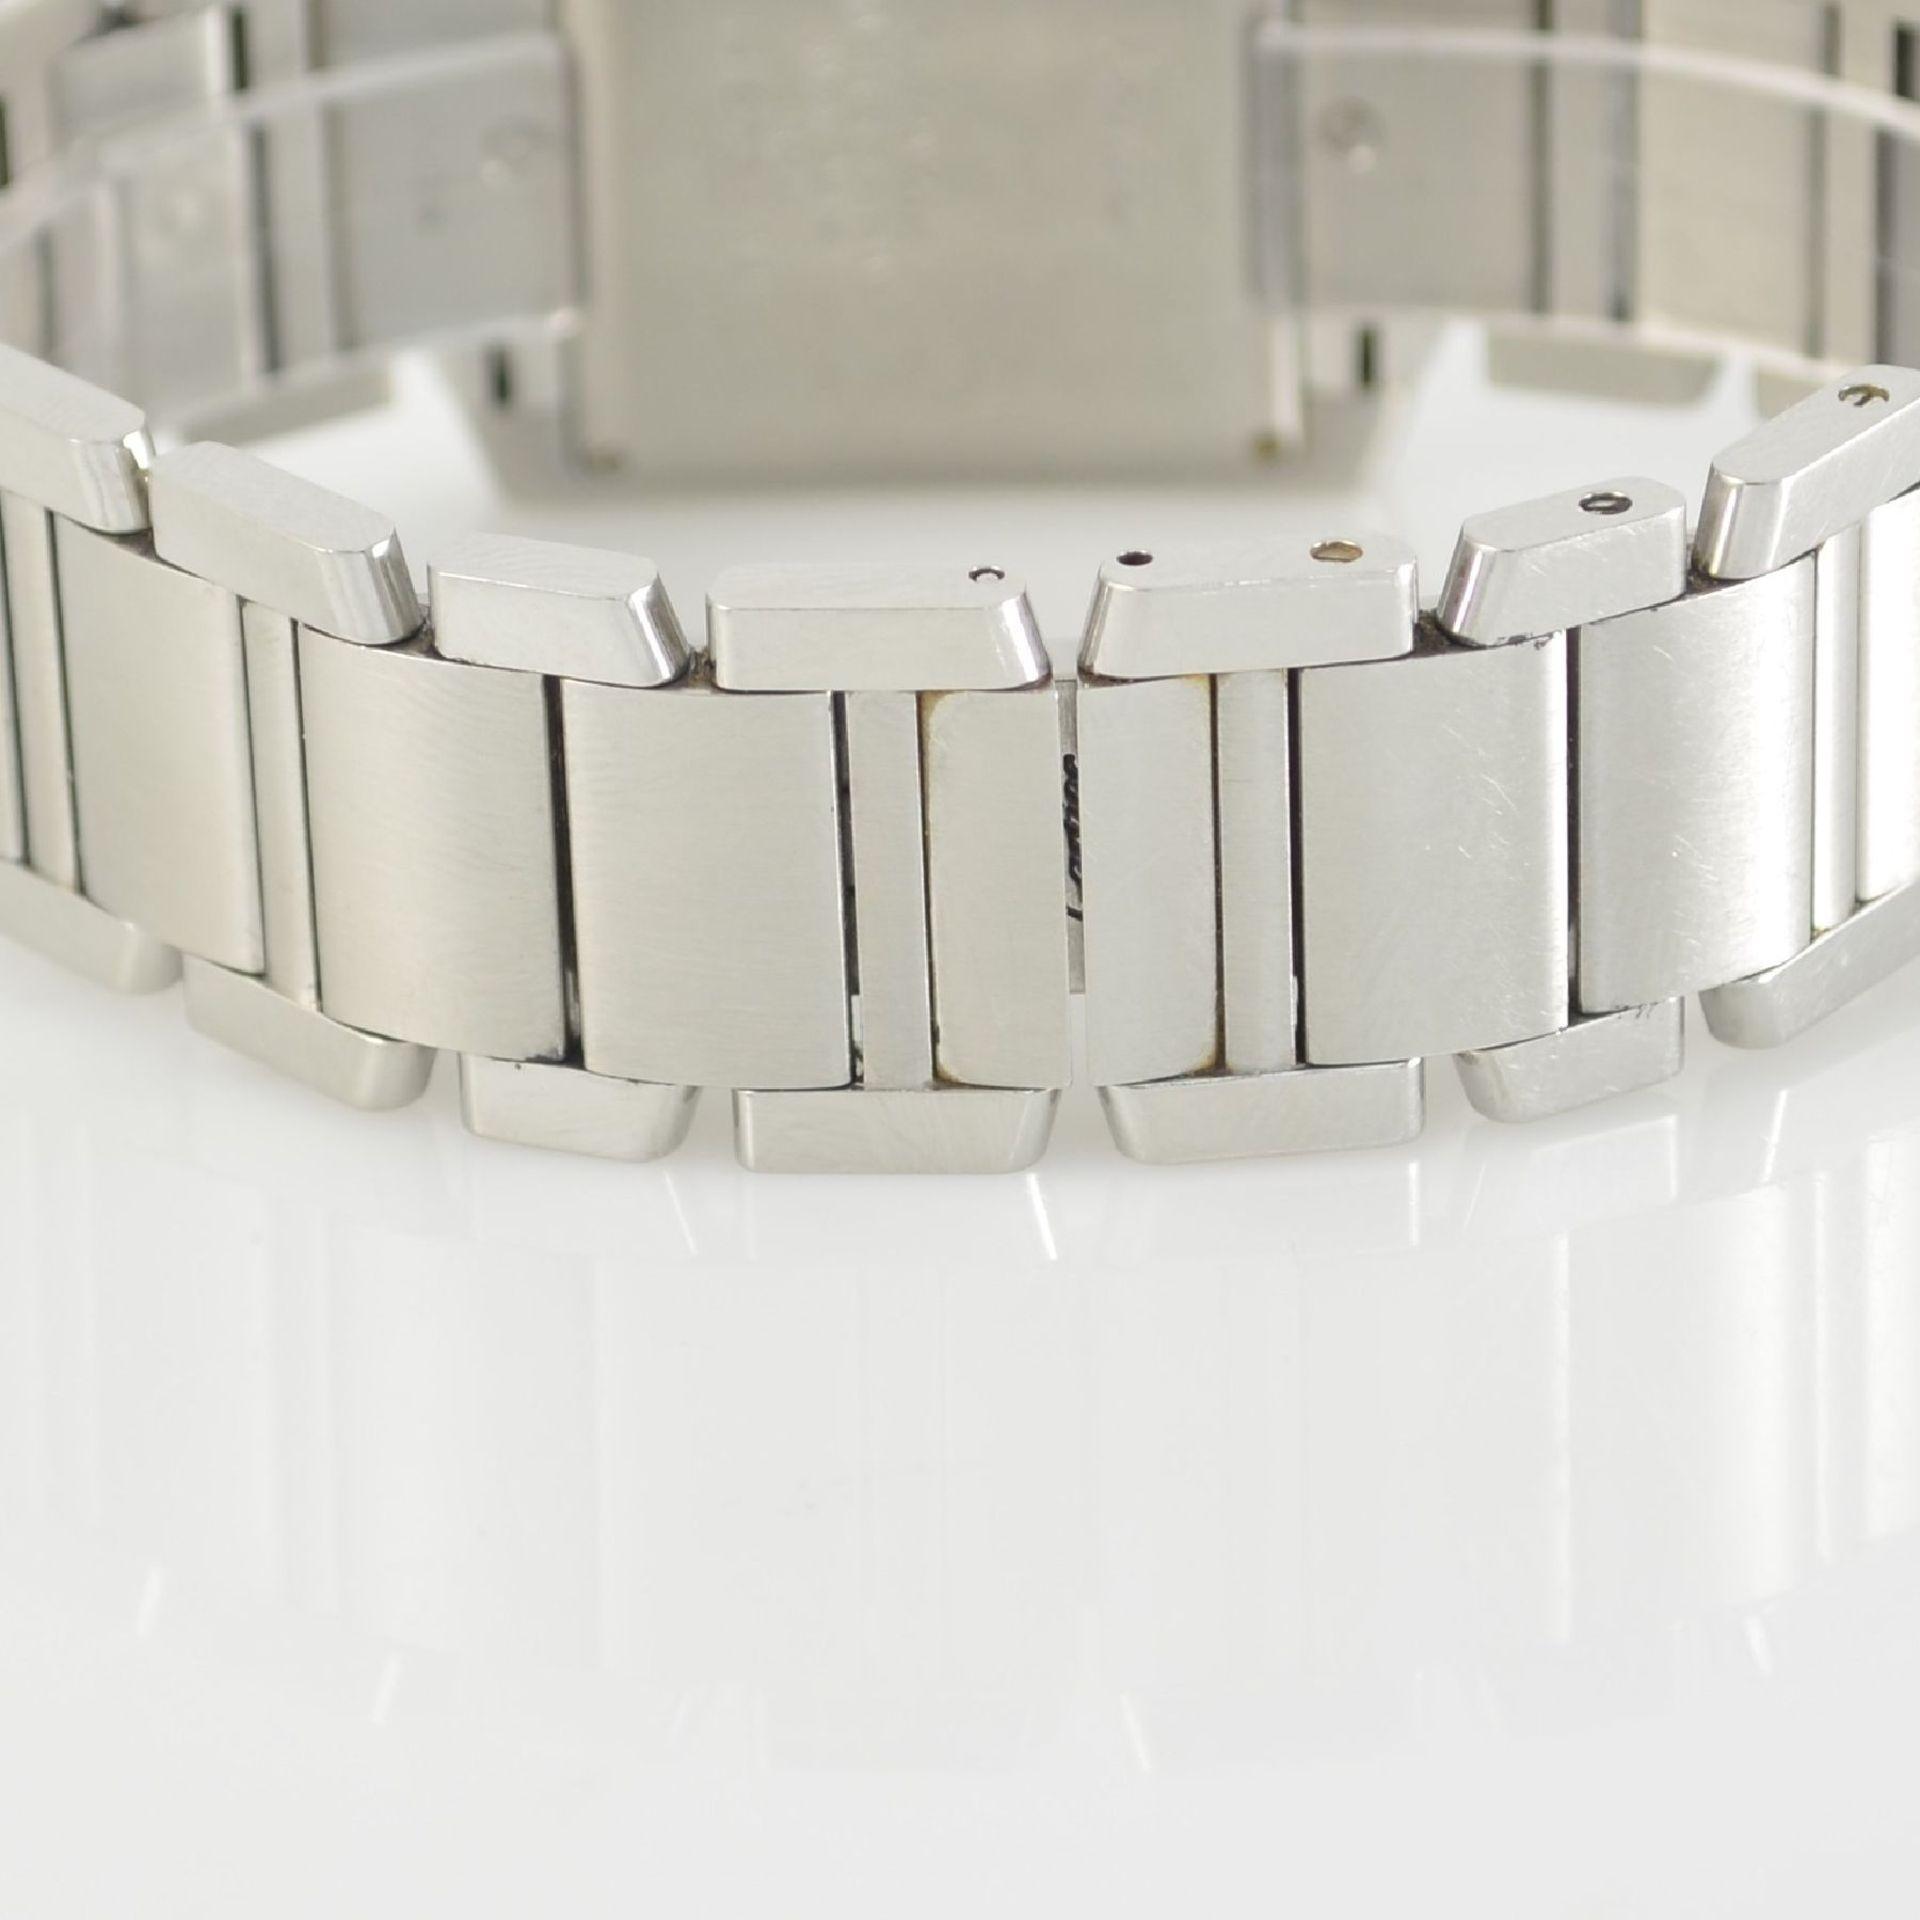 CARTIER Armbanduhr Tank Francaise, Automatik, Ref. 2302, Edelstahlgeh. inkl. Gliederband m. dopp. - Bild 5 aus 8